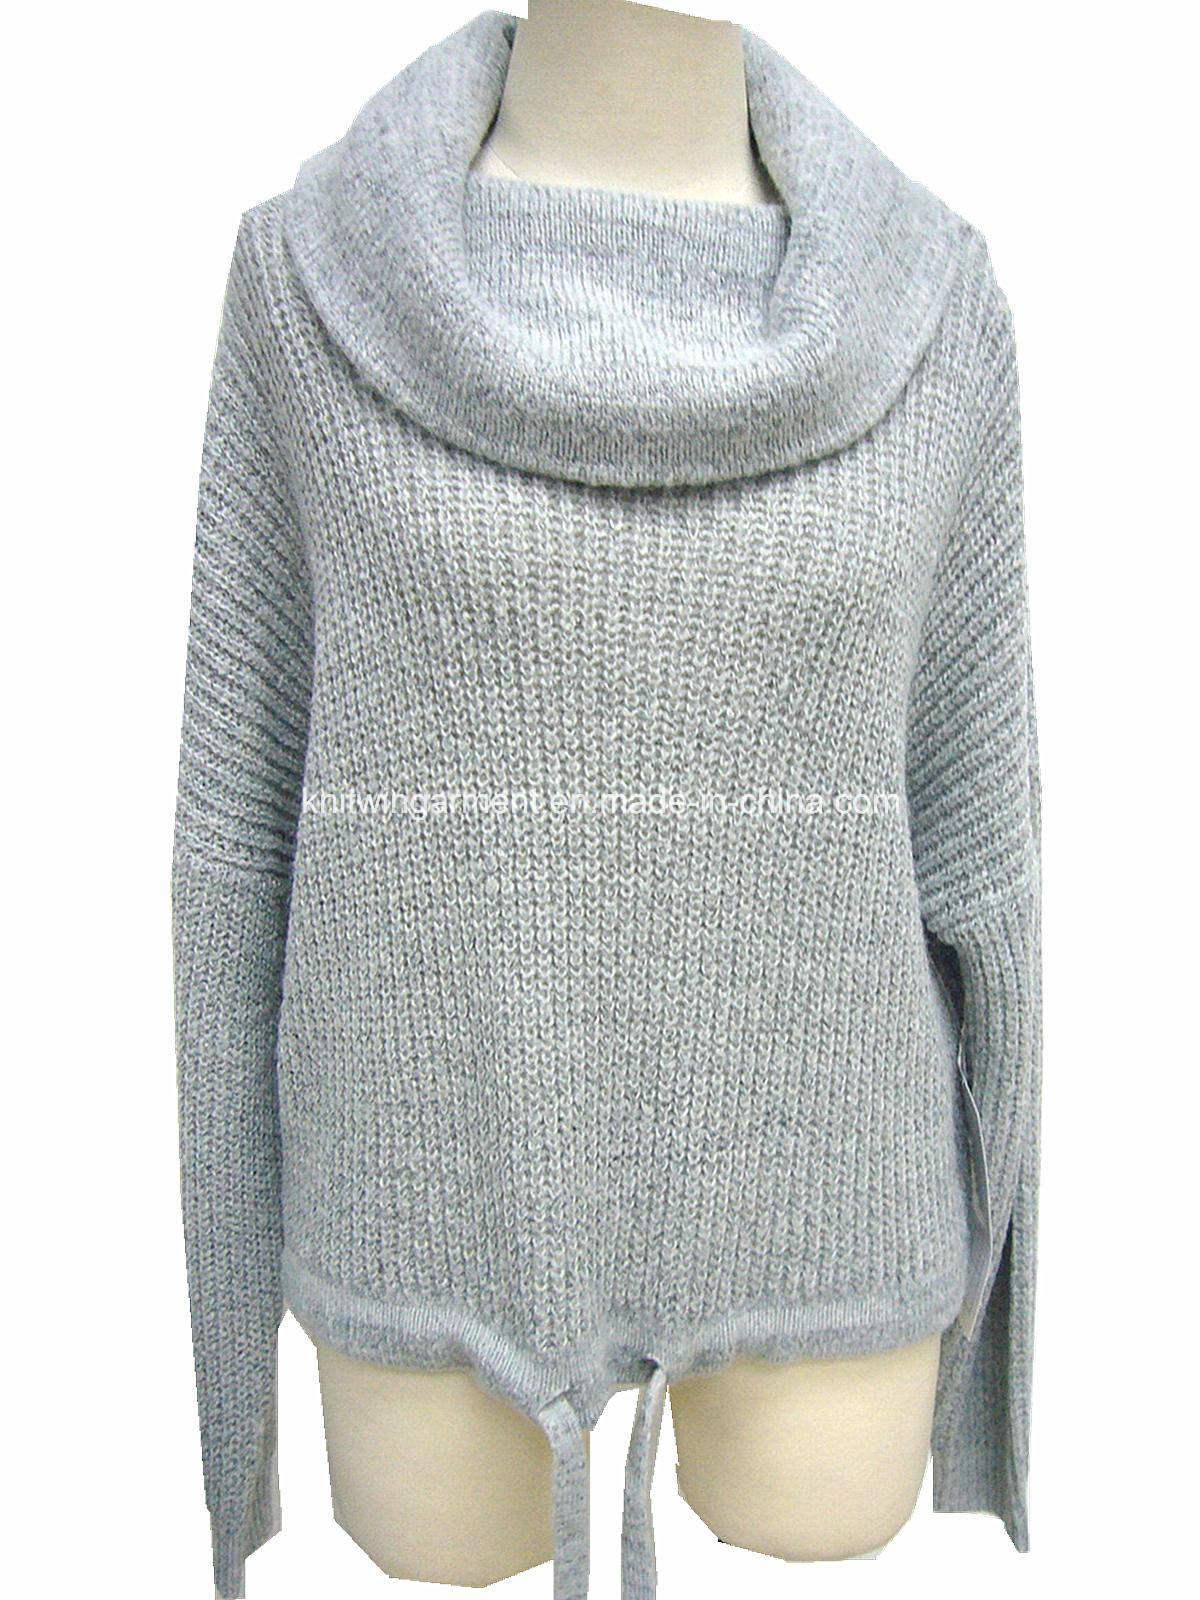 7ccd34c8a China Fashion Style Winter Woman Mohair Sweater Design (RS-032) - China  Fashion Sweater Zipper Jacket